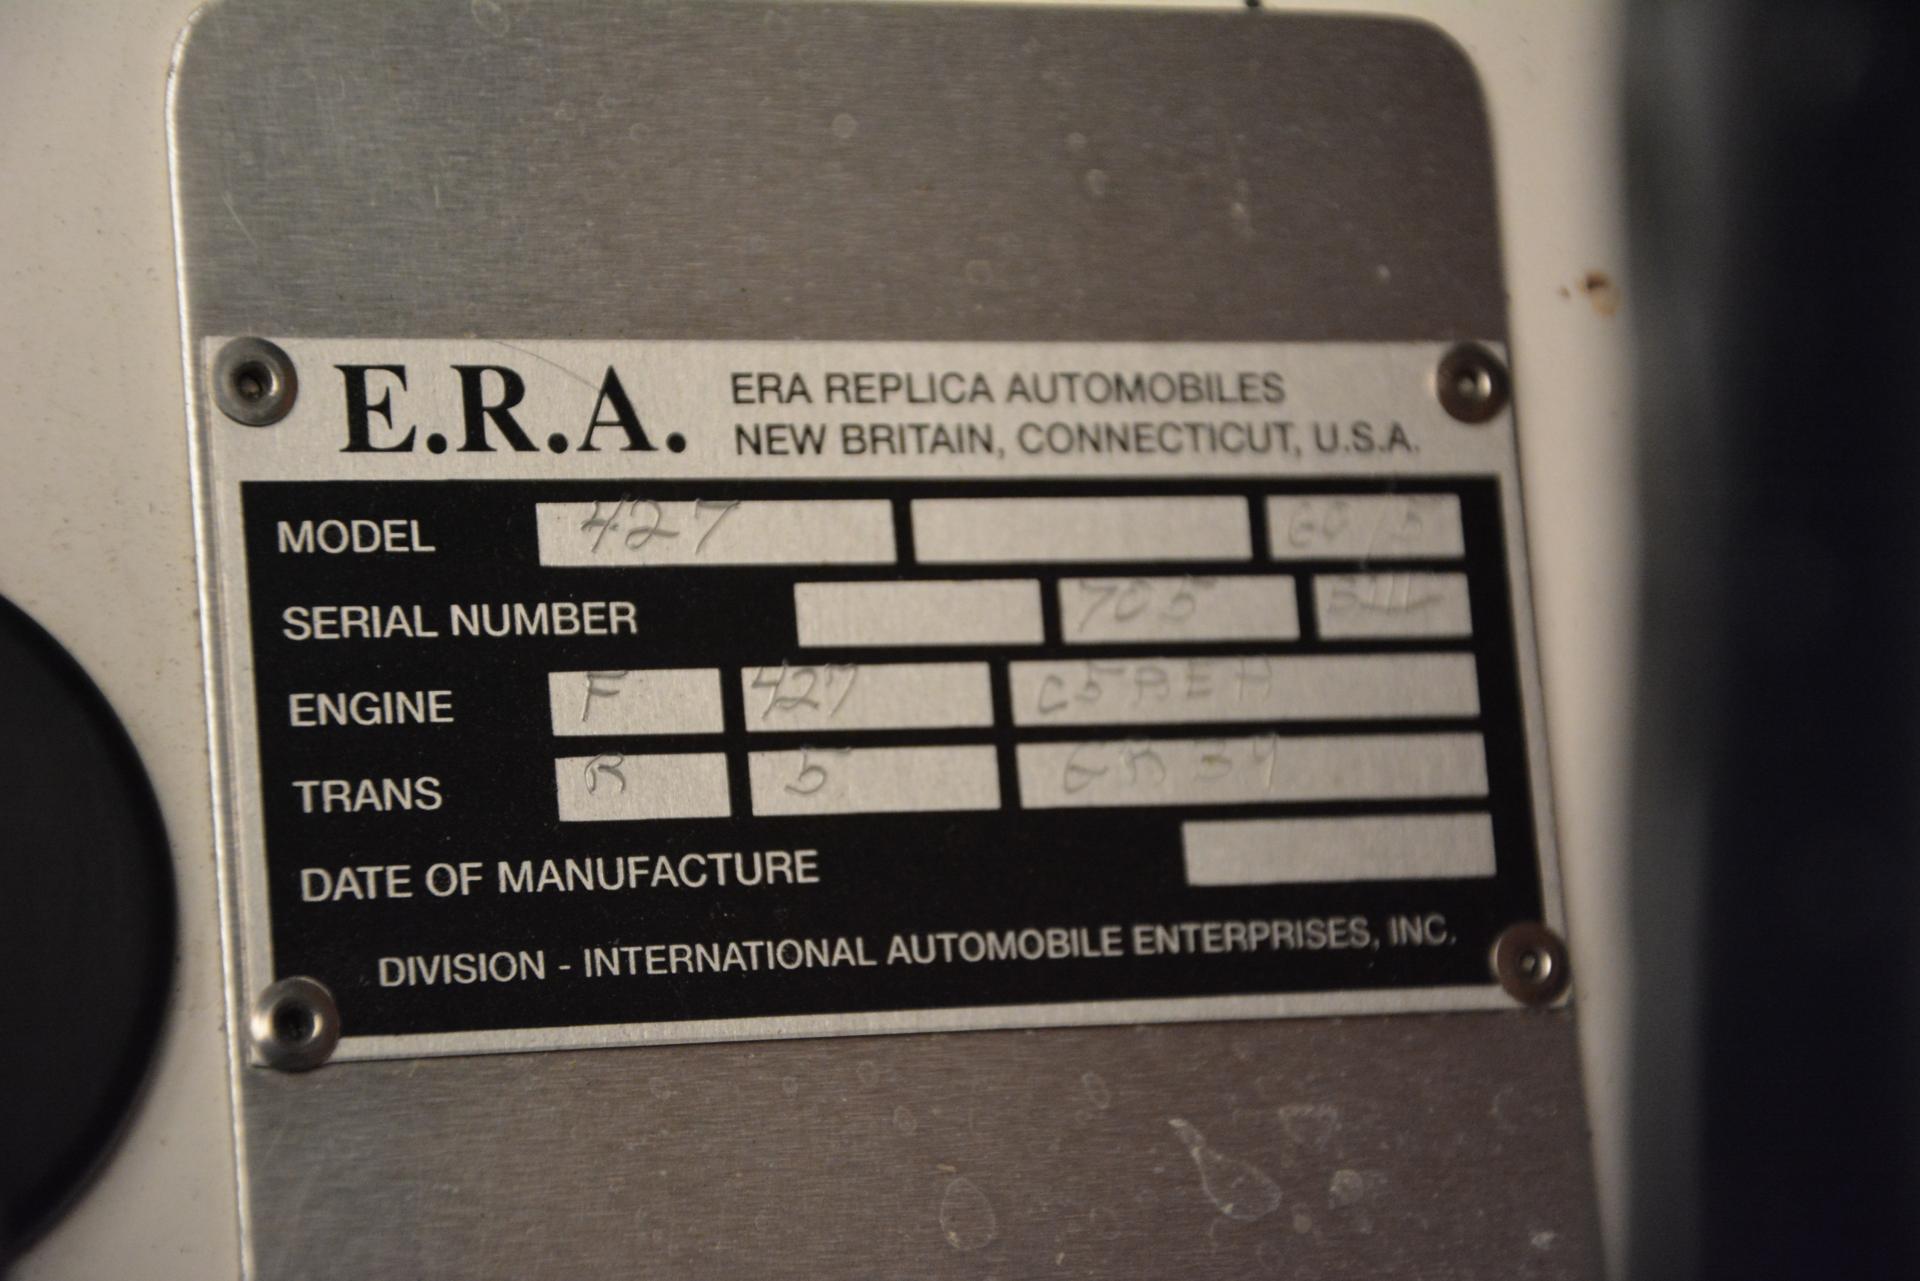 Used 2006 Ford ERA 427 SC  For Sale In Greenwich, CT. Alfa Romeo of Greenwich, 7051 107_p24